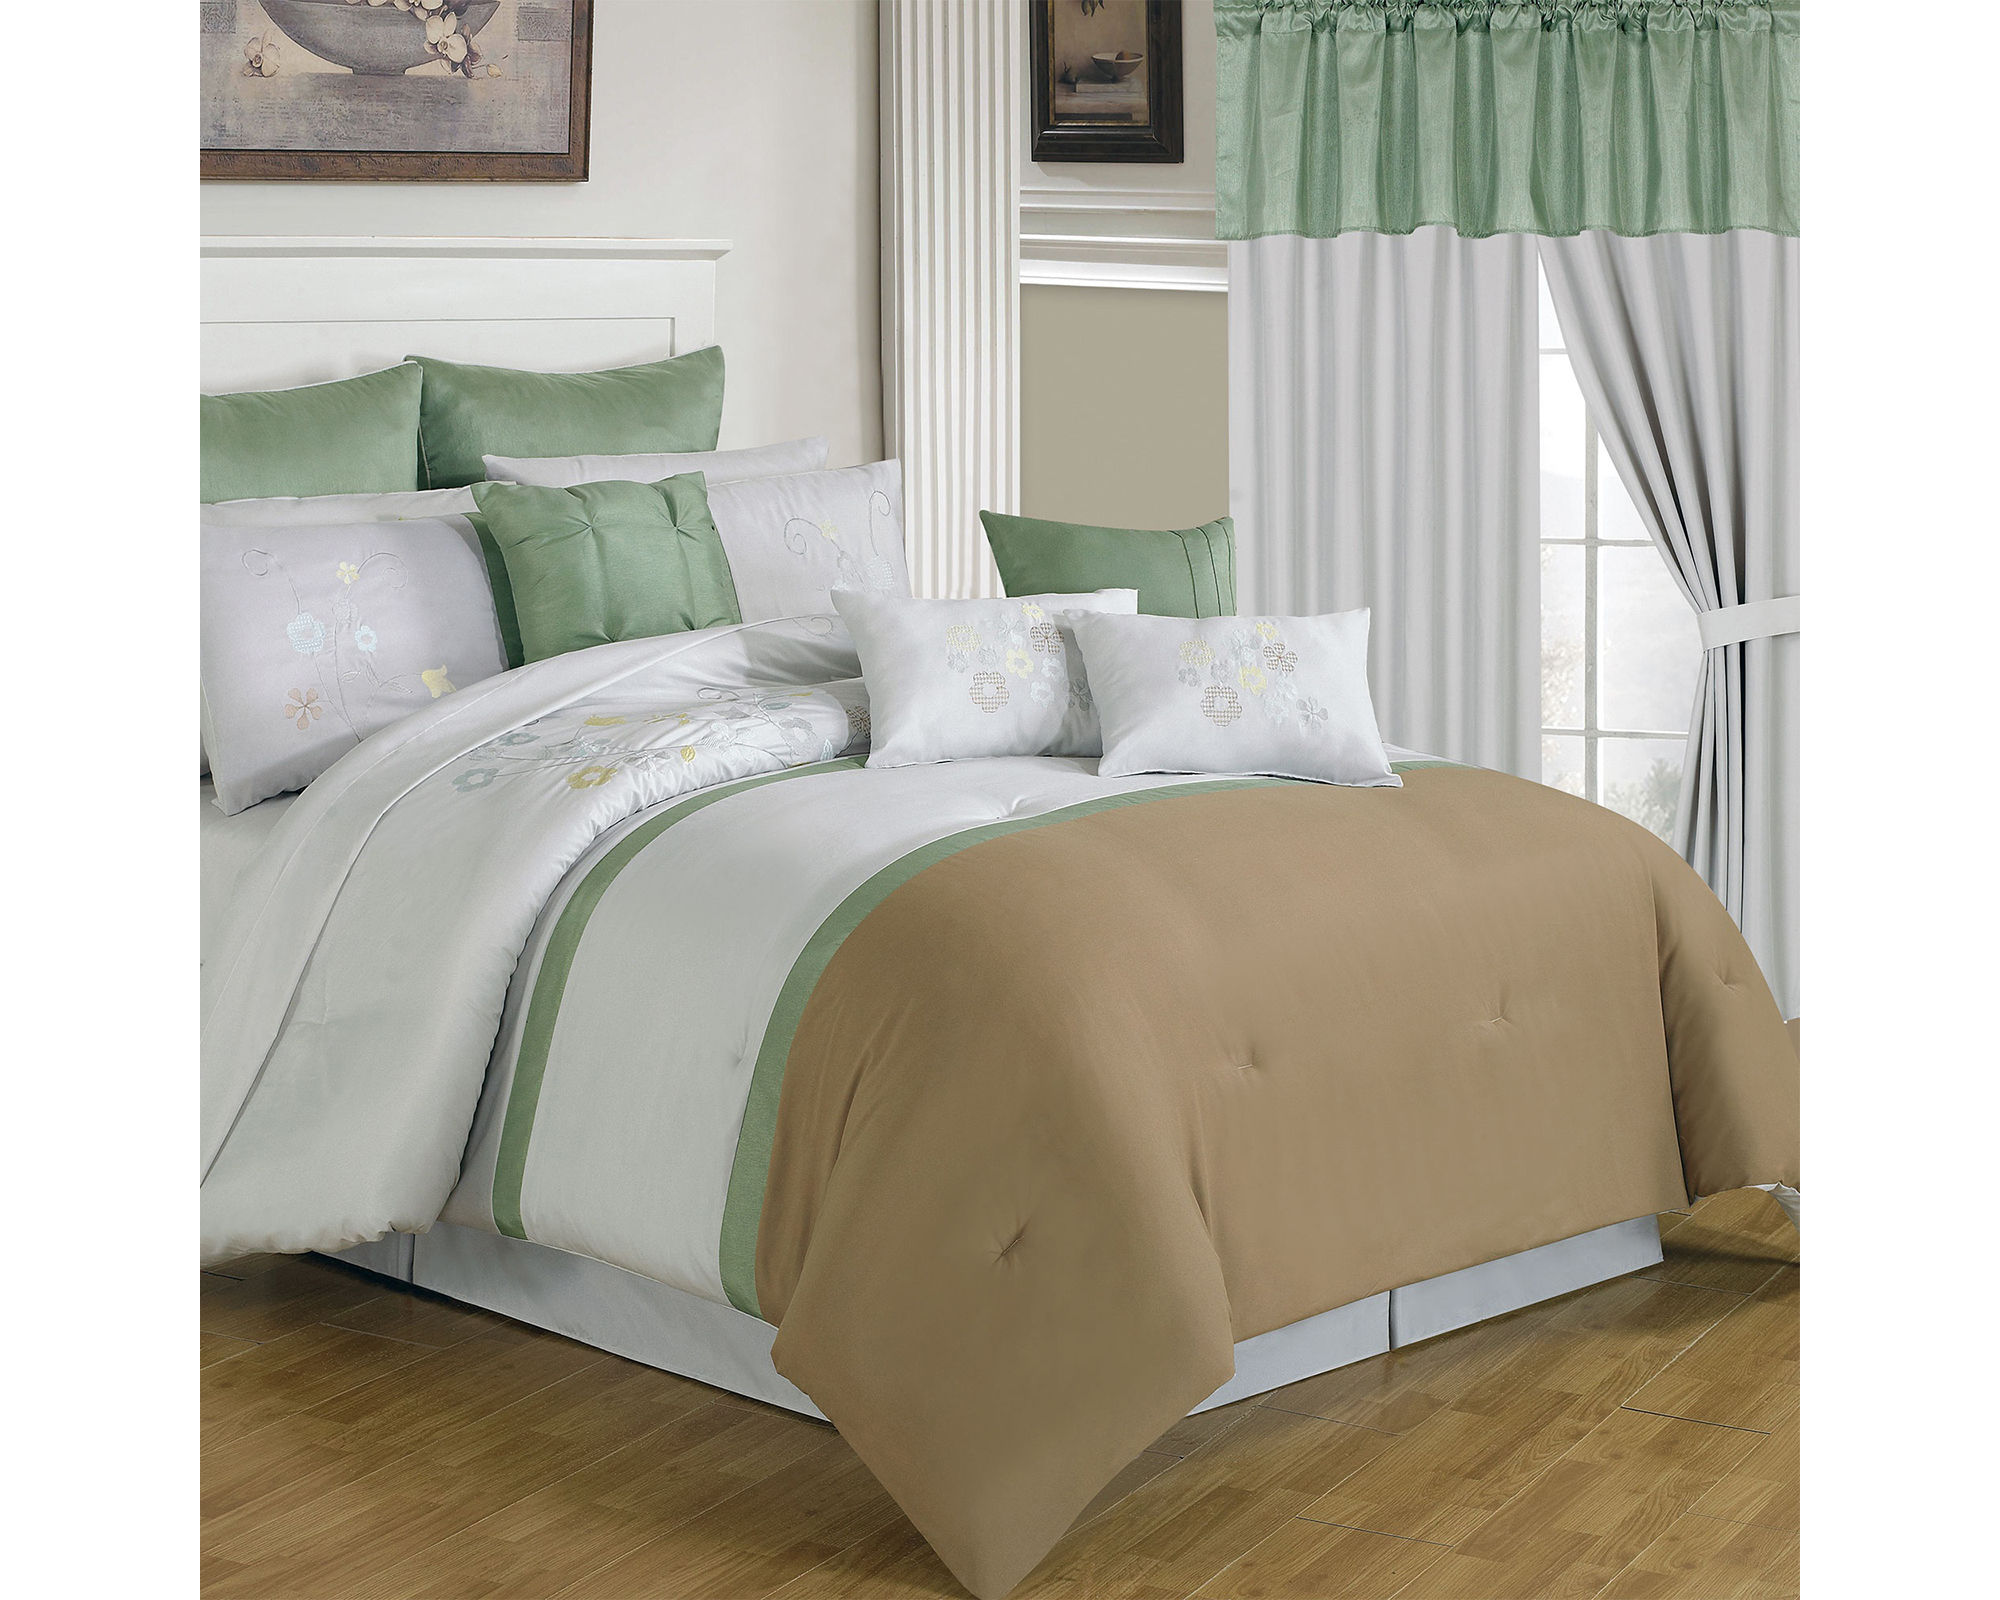 Cambridge Home Elizabeth Complete Bedding Set with Sheets